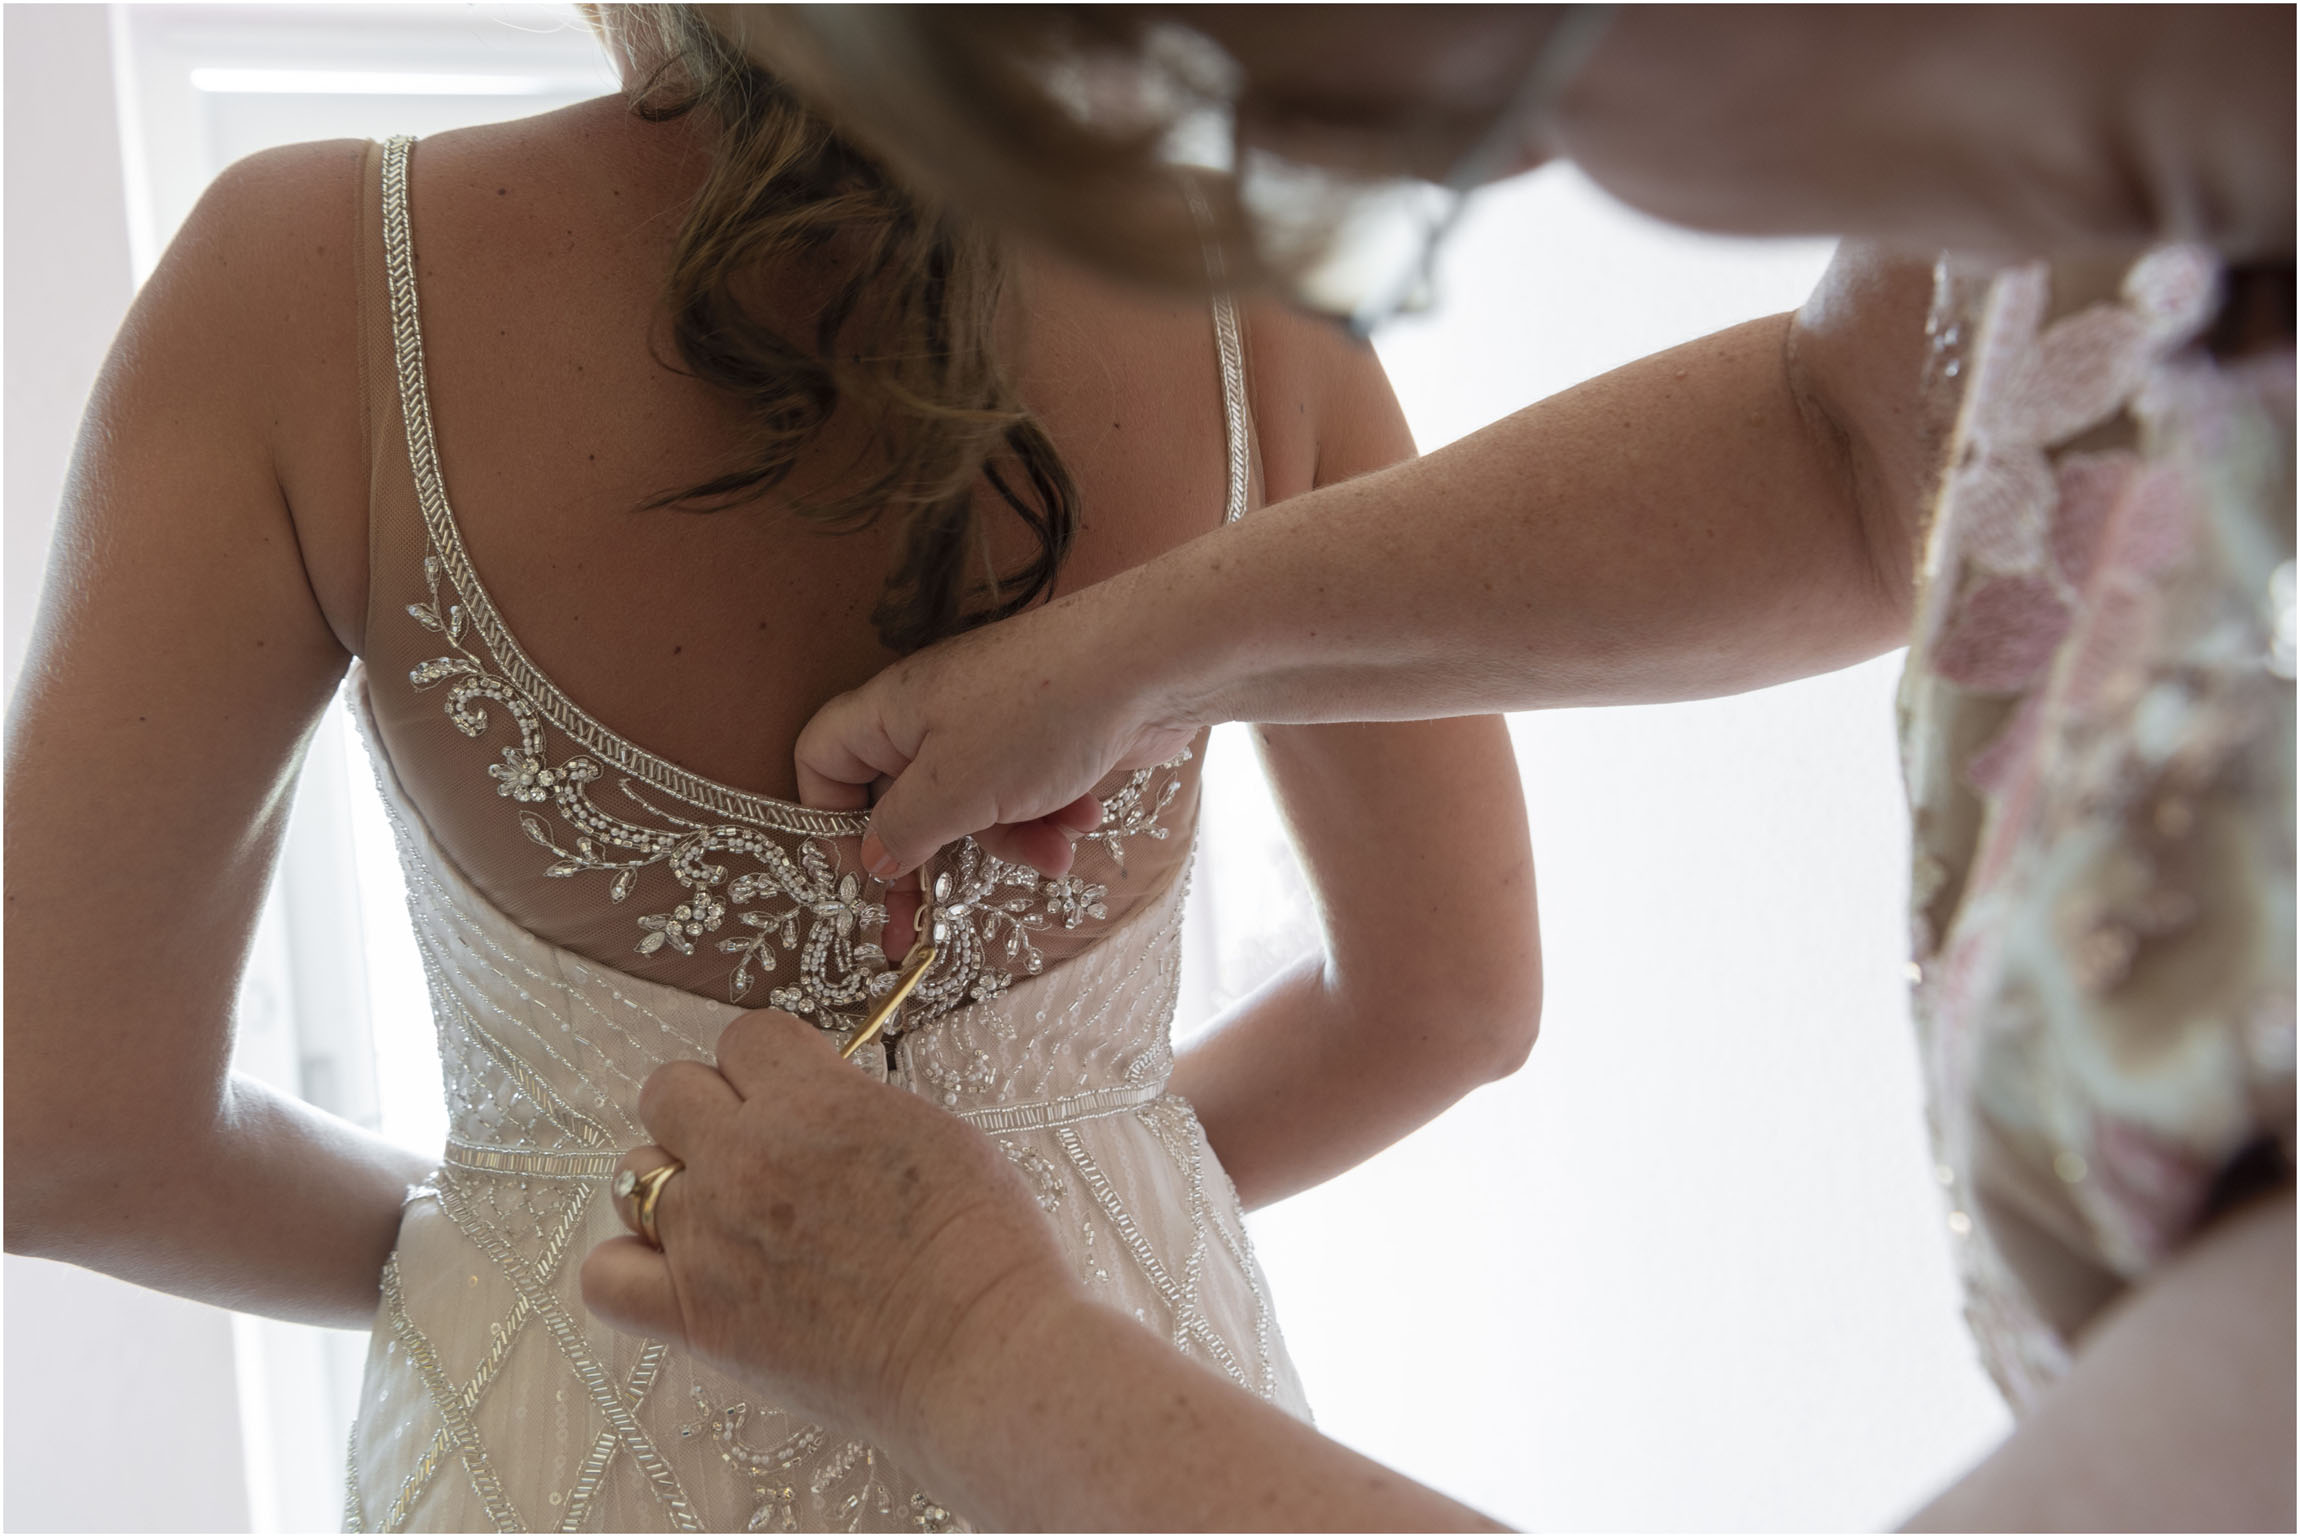 ©FianderFoto_Catherine_Kenny_Coral+Beach+Wedding_020.jpg